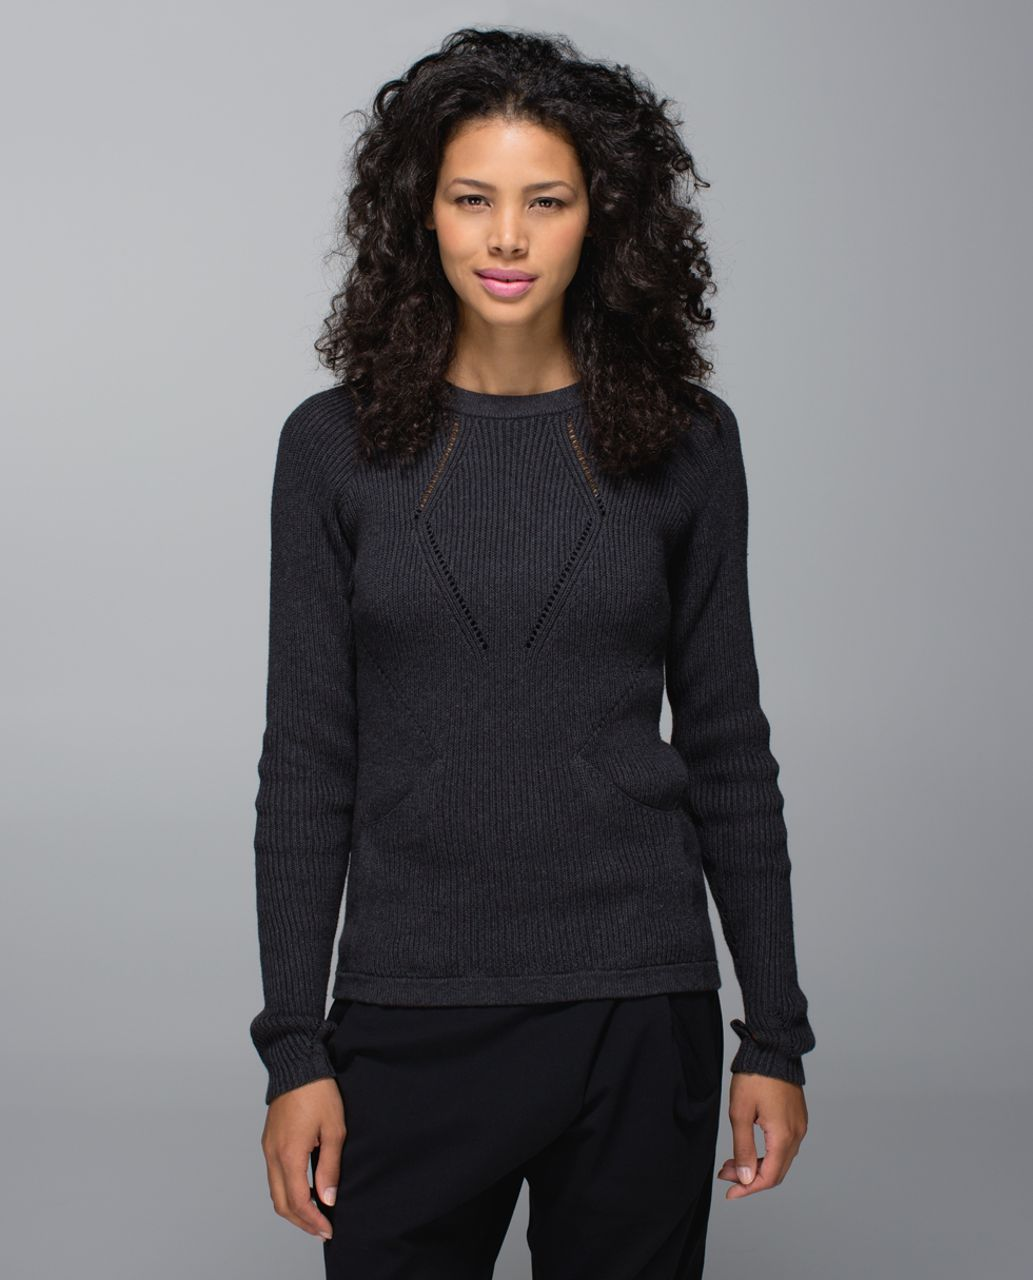 Lululemon The Sweater The Better - Heathered Black